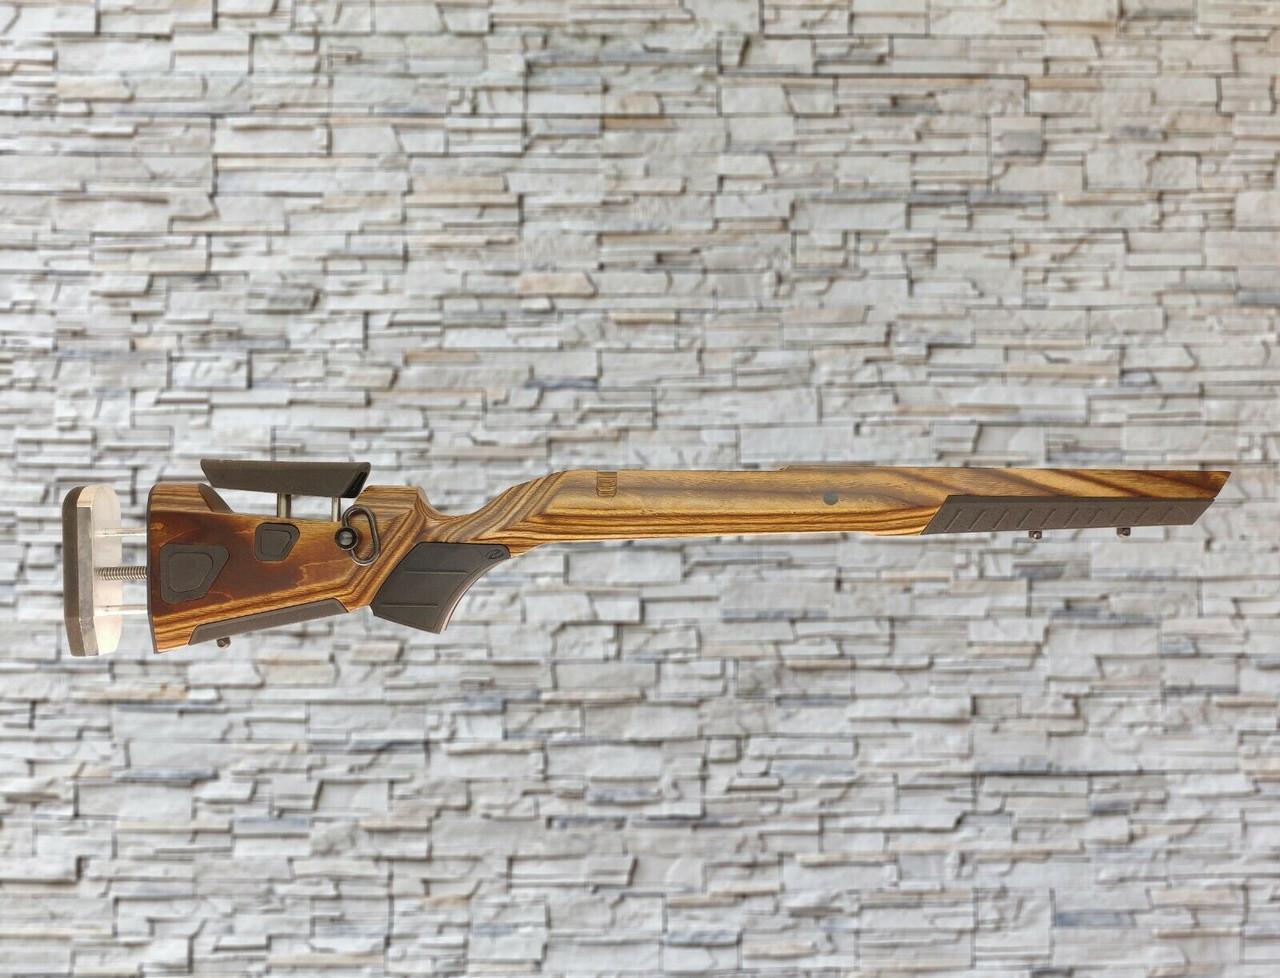 Boyds At-One Adjustable Wood Stock Nutmeg For Tikka T3 Factory Barrel Rifle